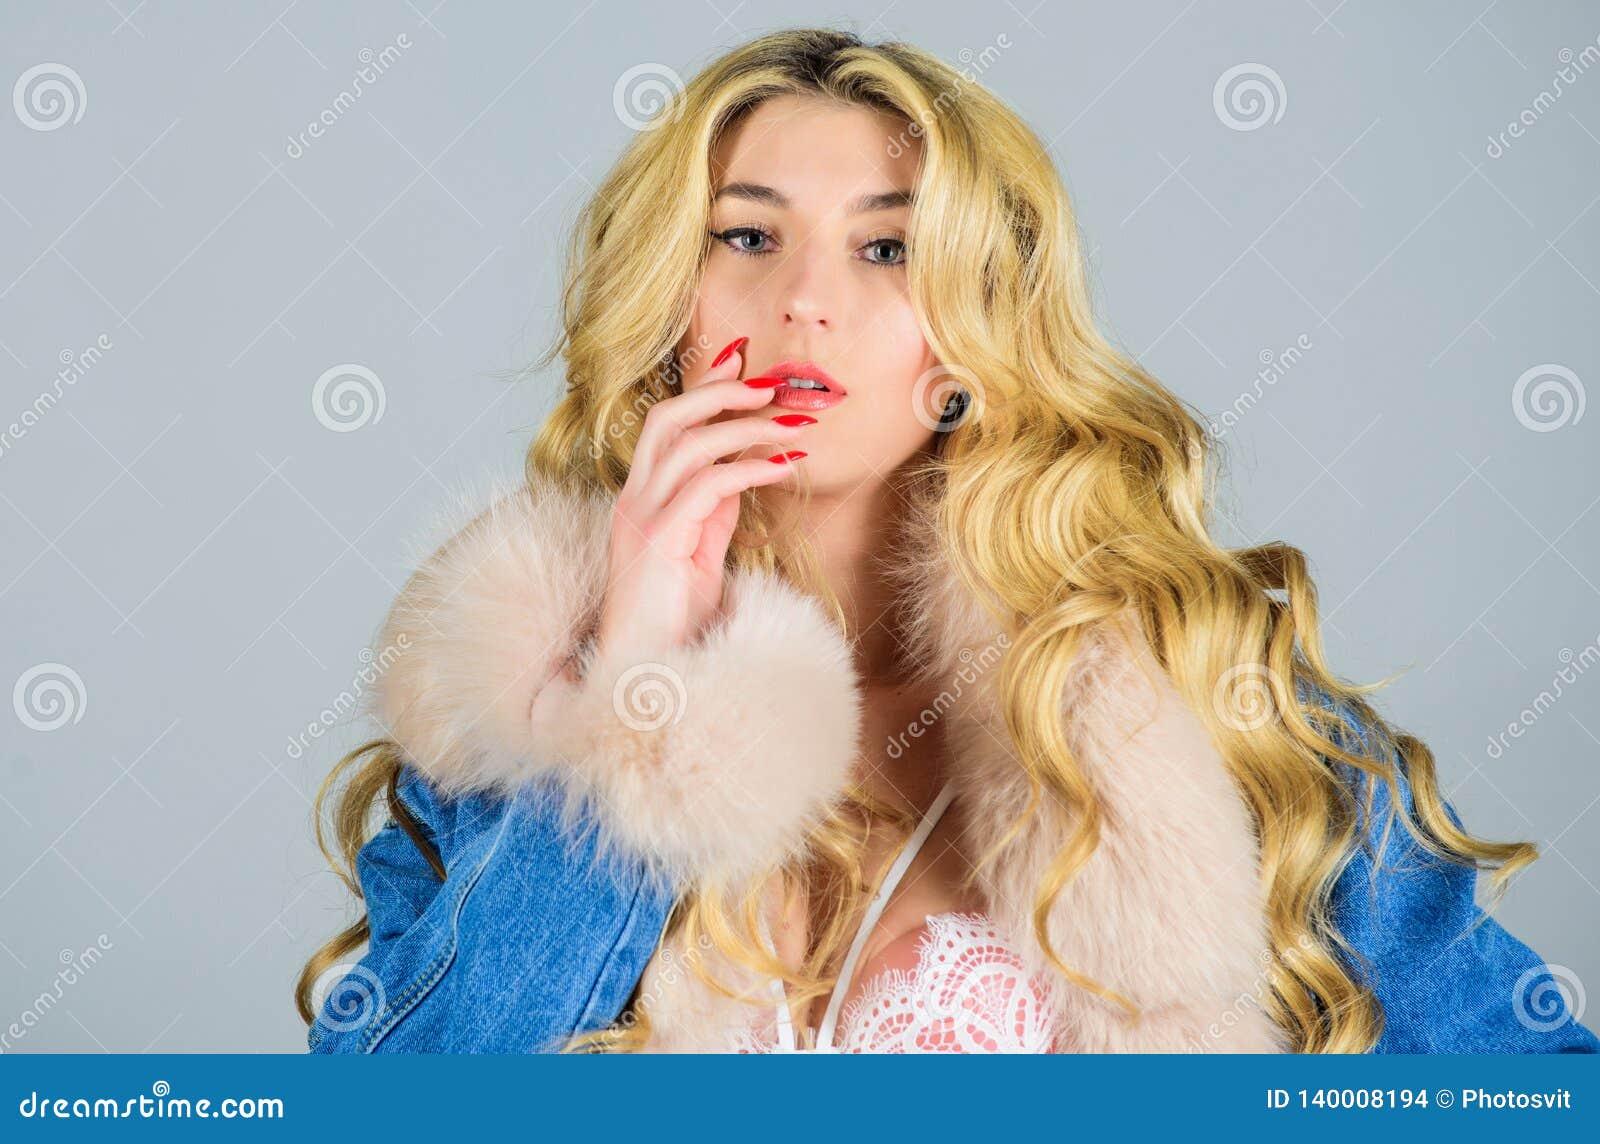 df655bb40b0 Woman Lingerie Fur Coat Stock Images - Download 39 Royalty Free Photos